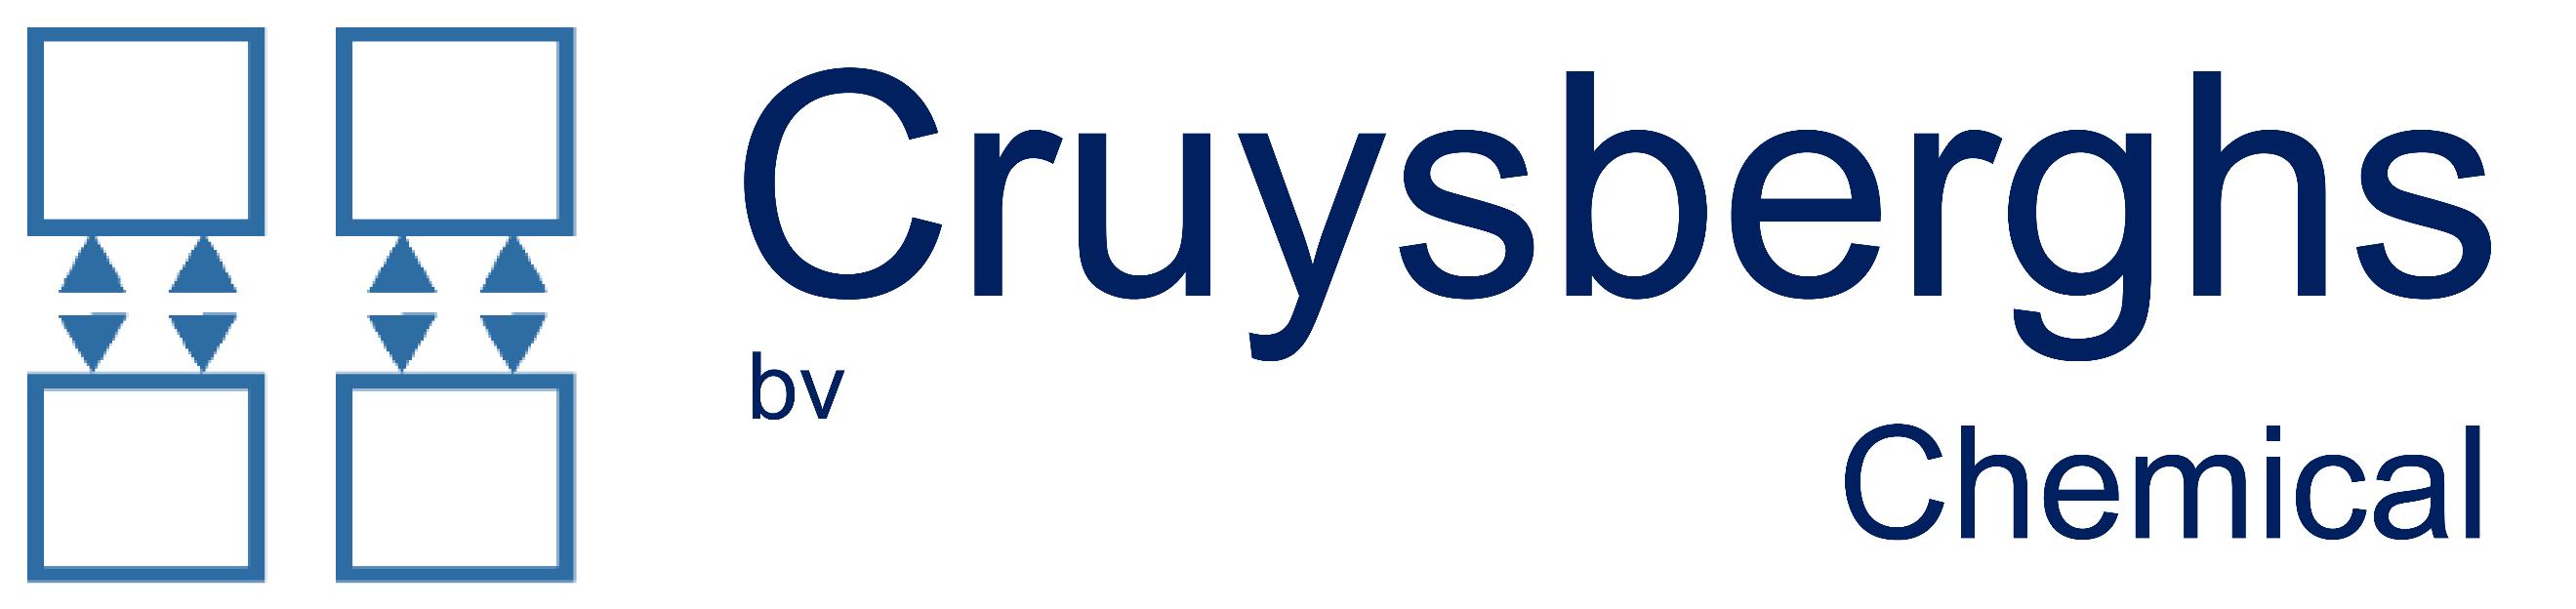 Cruysberghs Chemical bvba